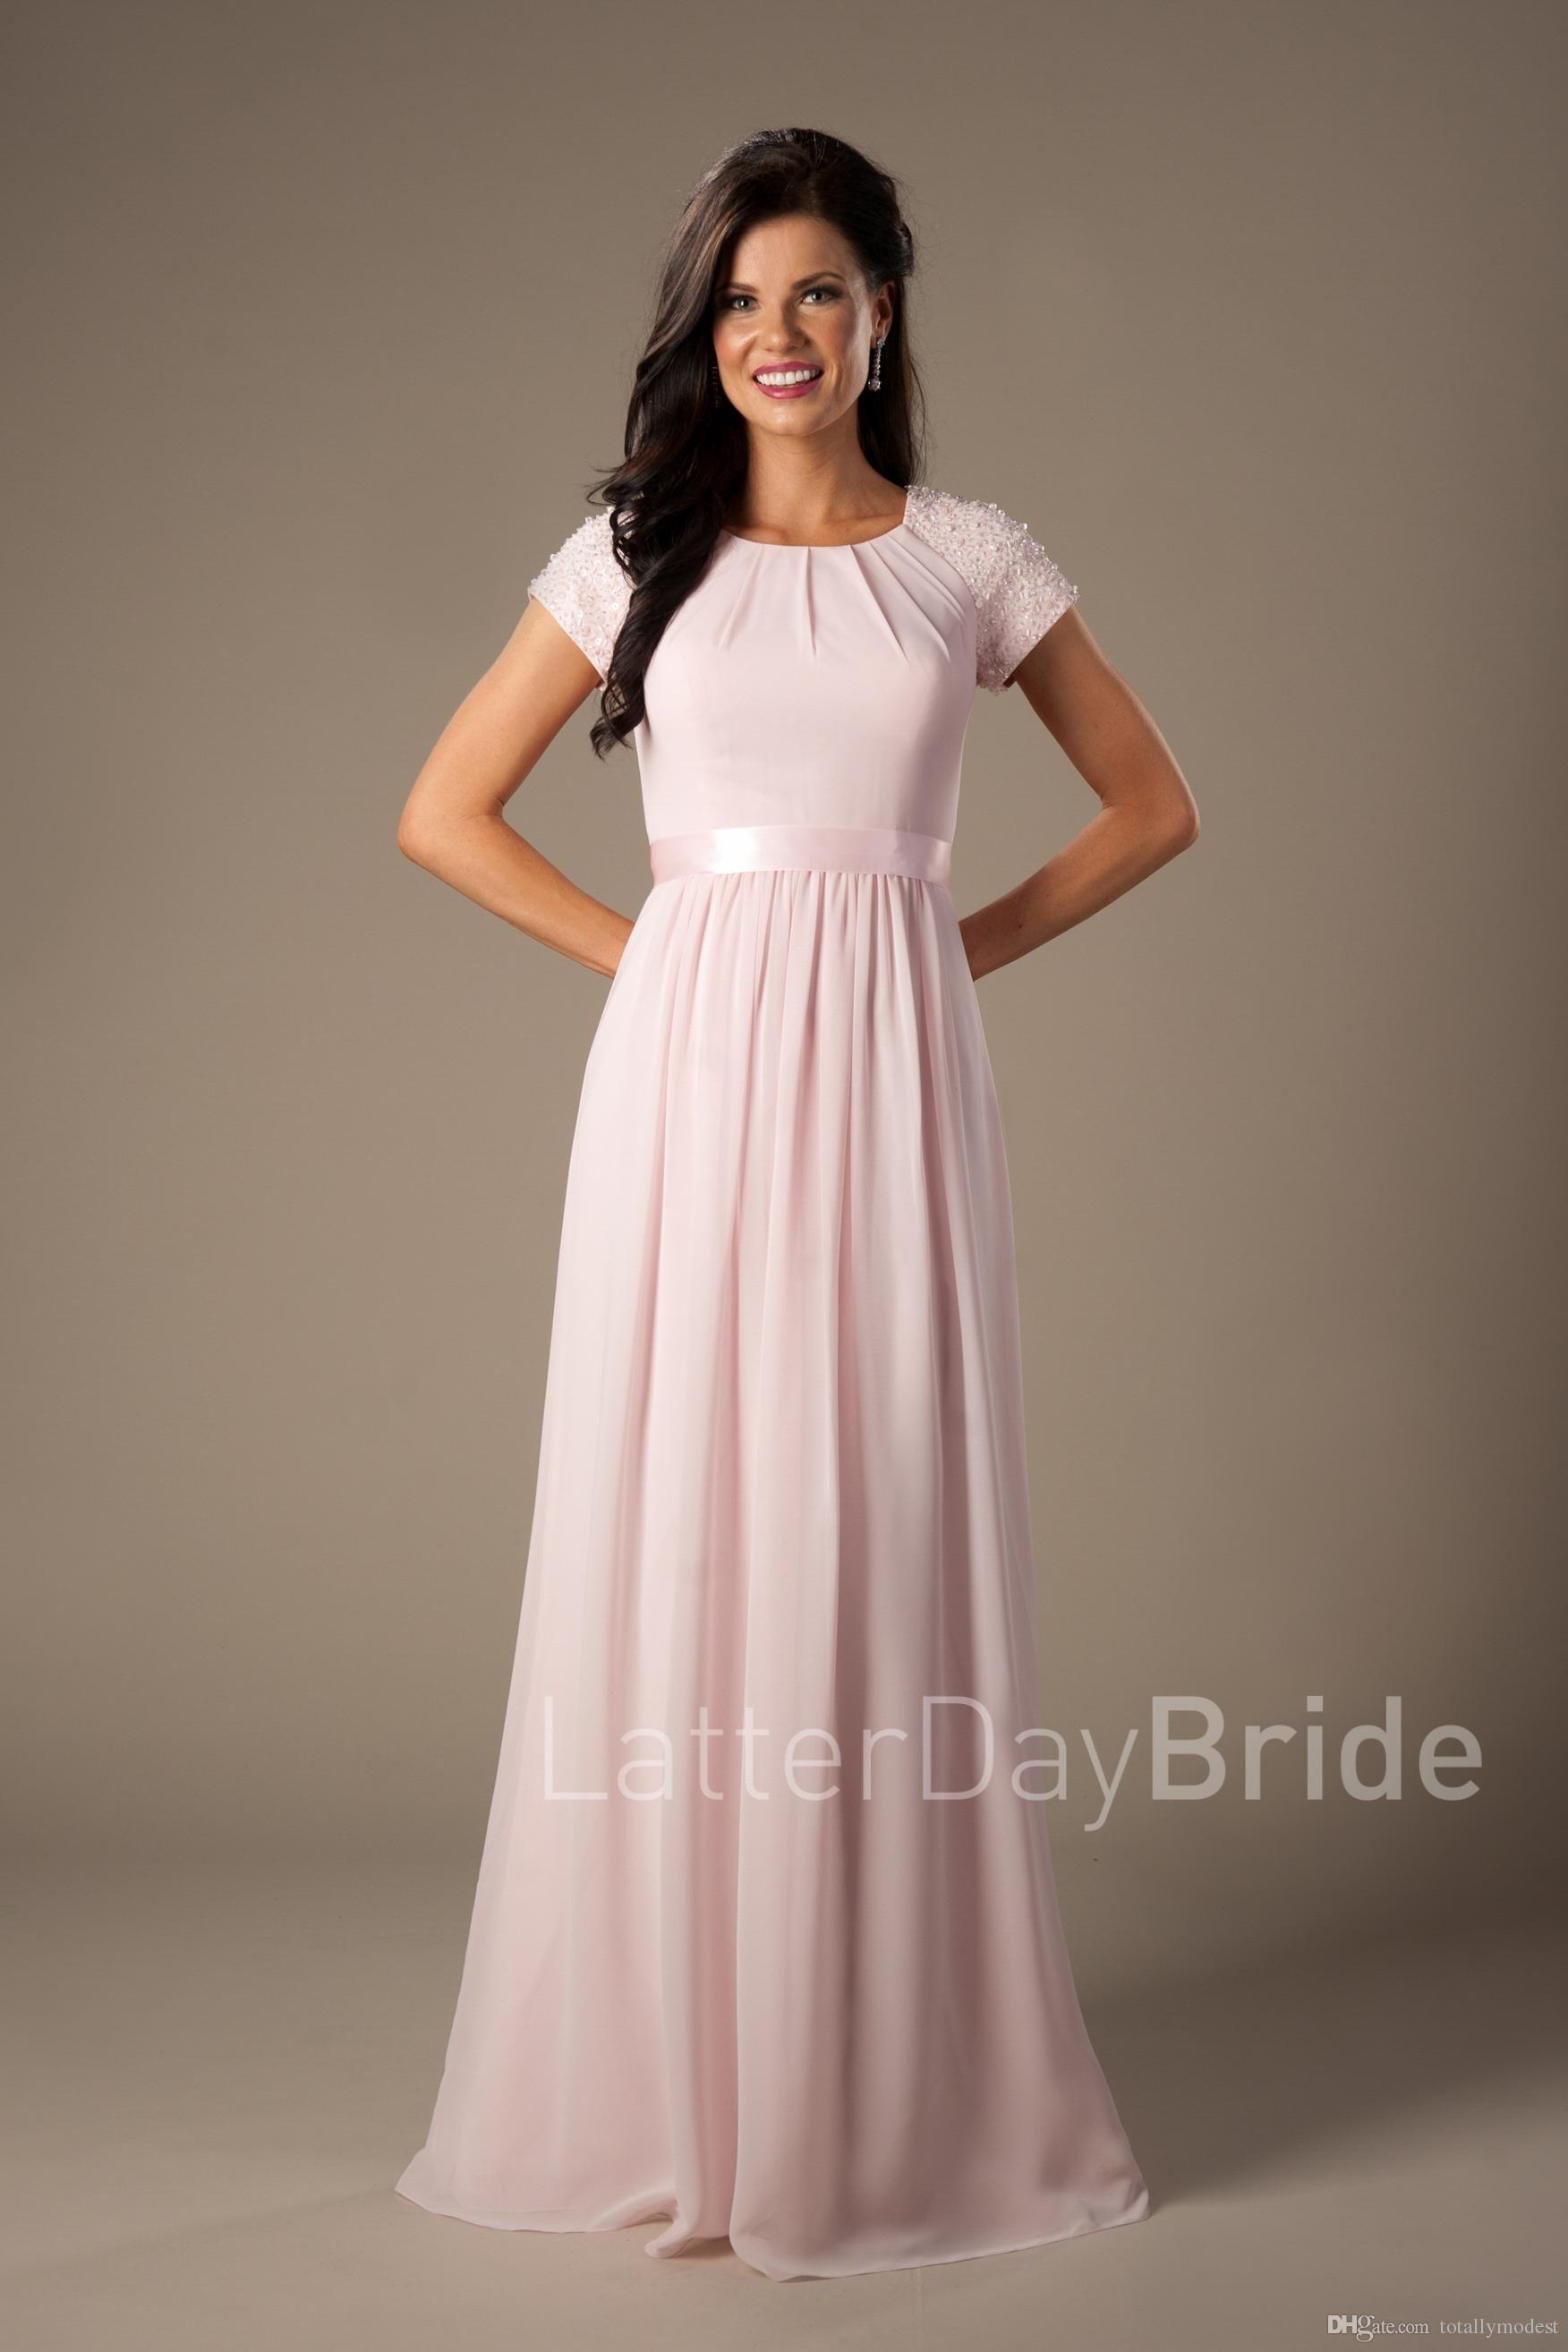 Blue grey wedding dress   pick colors  Modest Bridesmaid Dresses  Pinterest  Modest